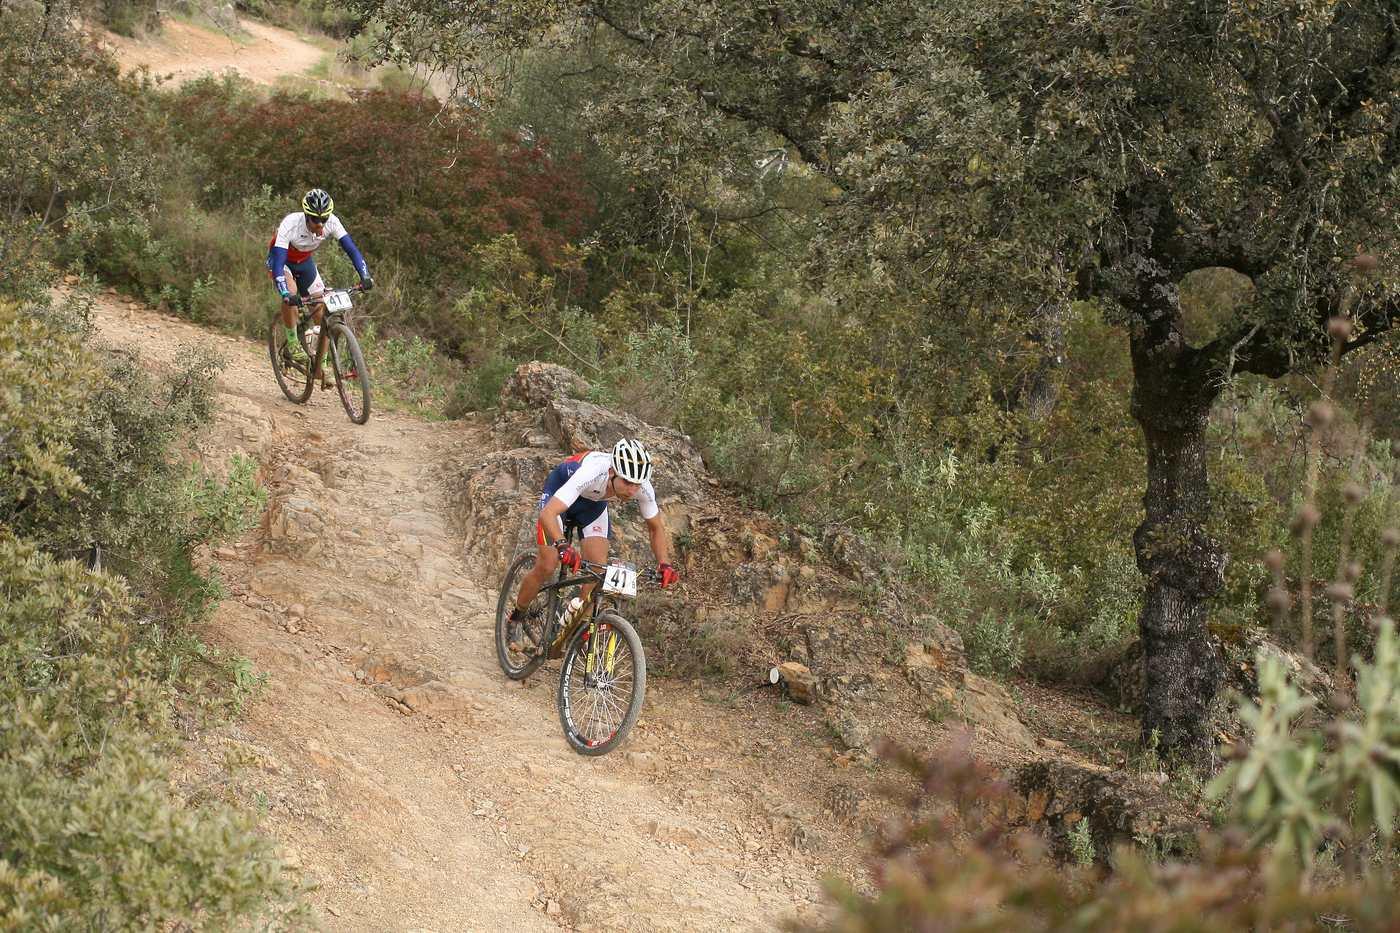 Andaluciabikerace-6szakasz2688_S6RSLS_00124.JPG